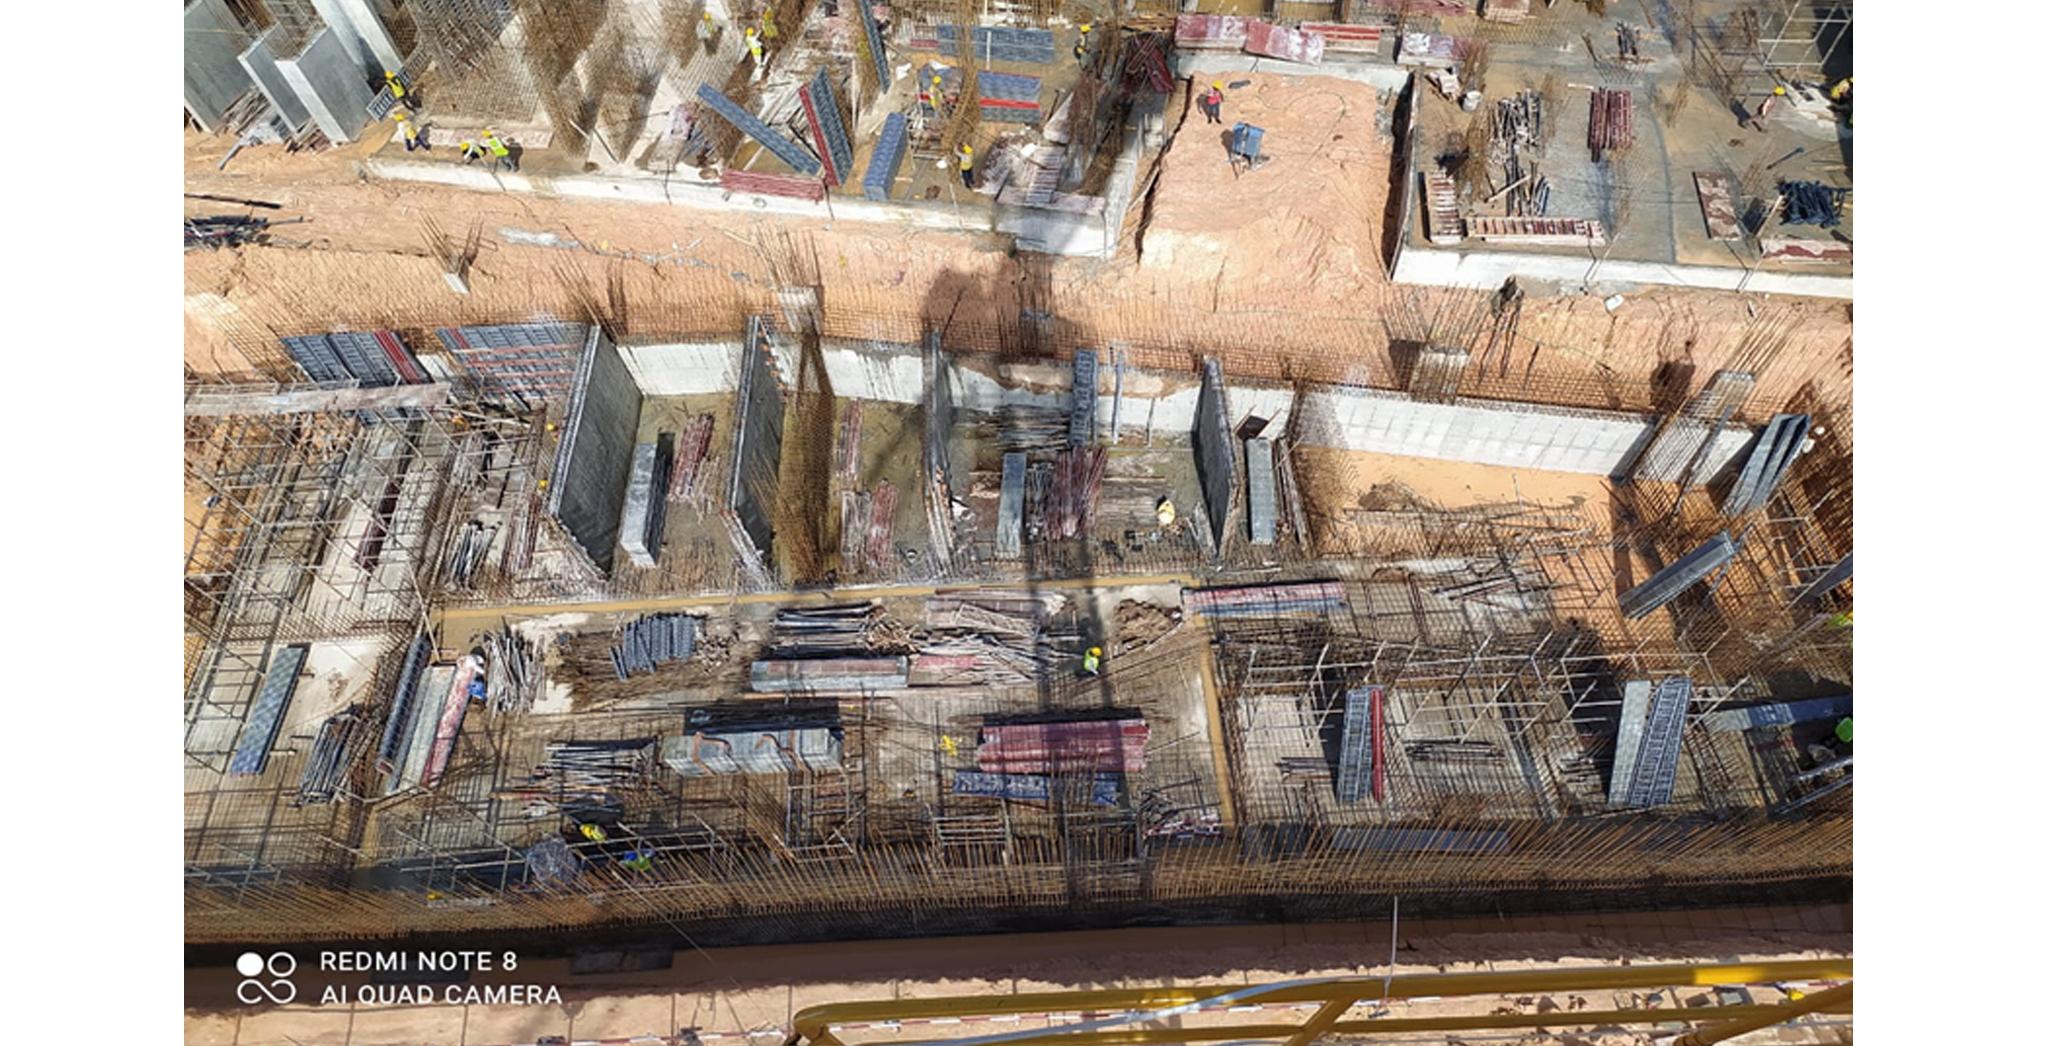 Aug 2021 - Krypton Block: STP Wall concrete in progress